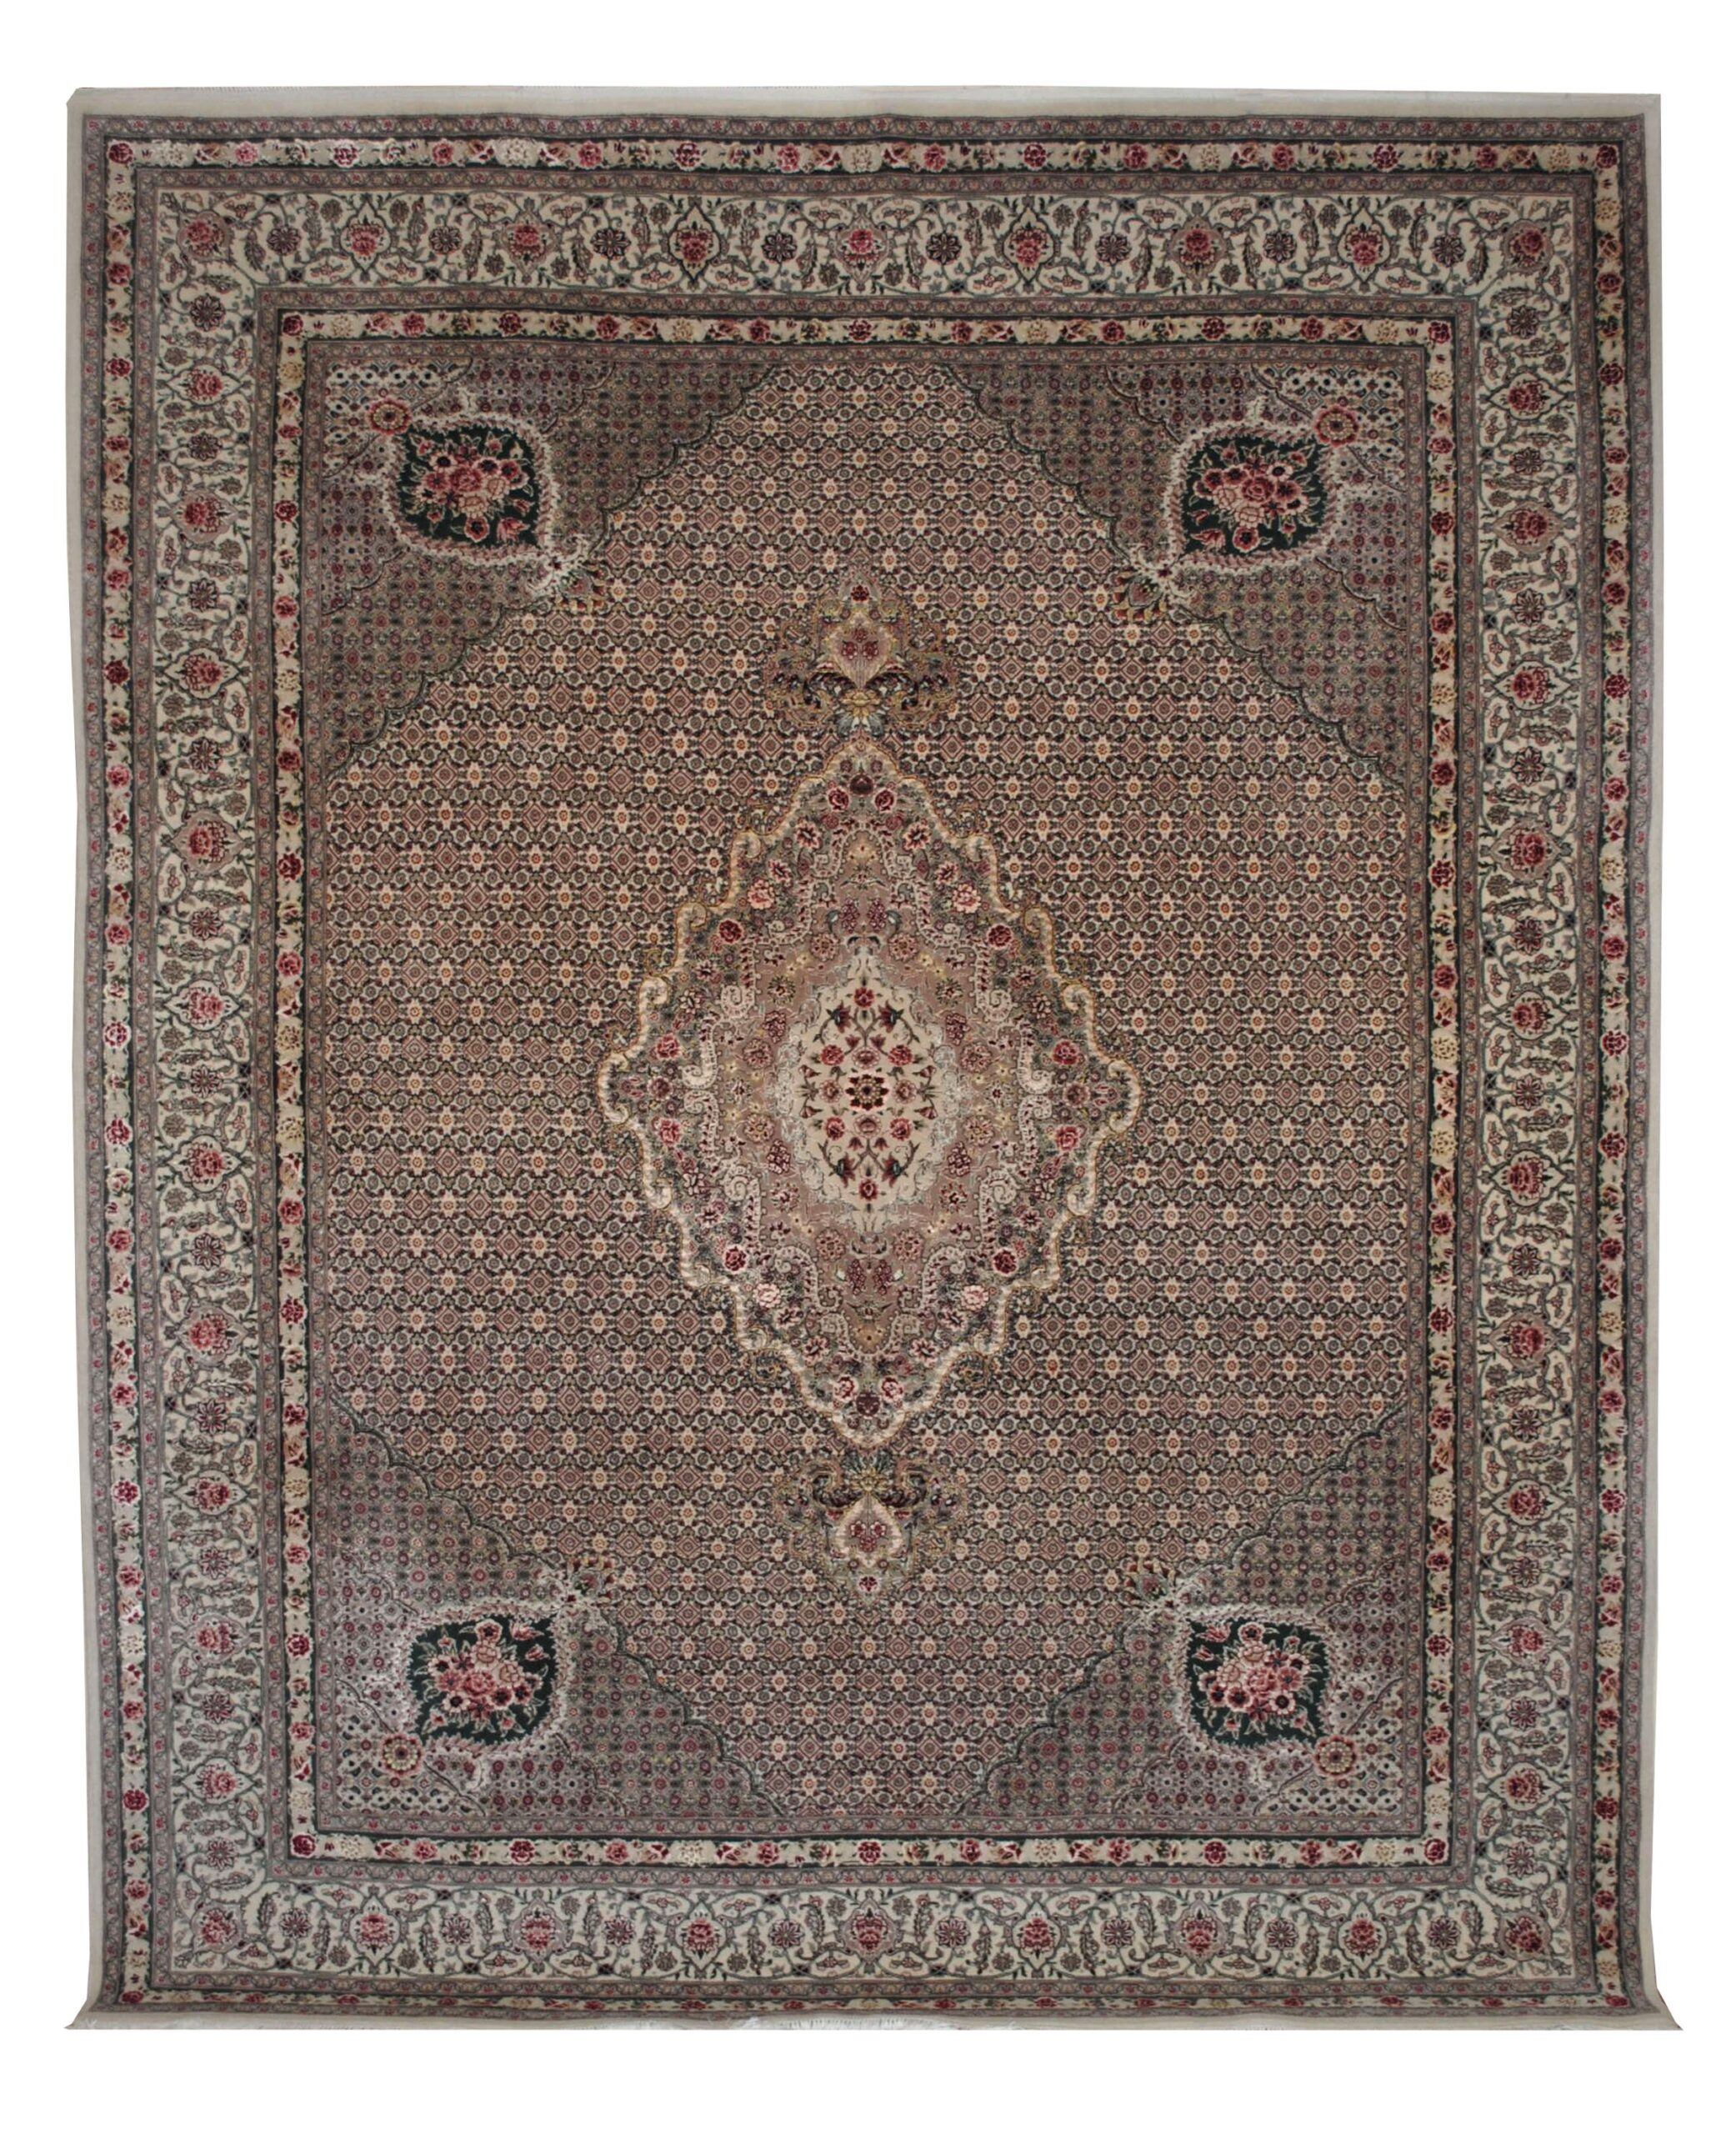 Tabriz 8' x 10' Handmade Area Rug - Shabahang Royal Carpet